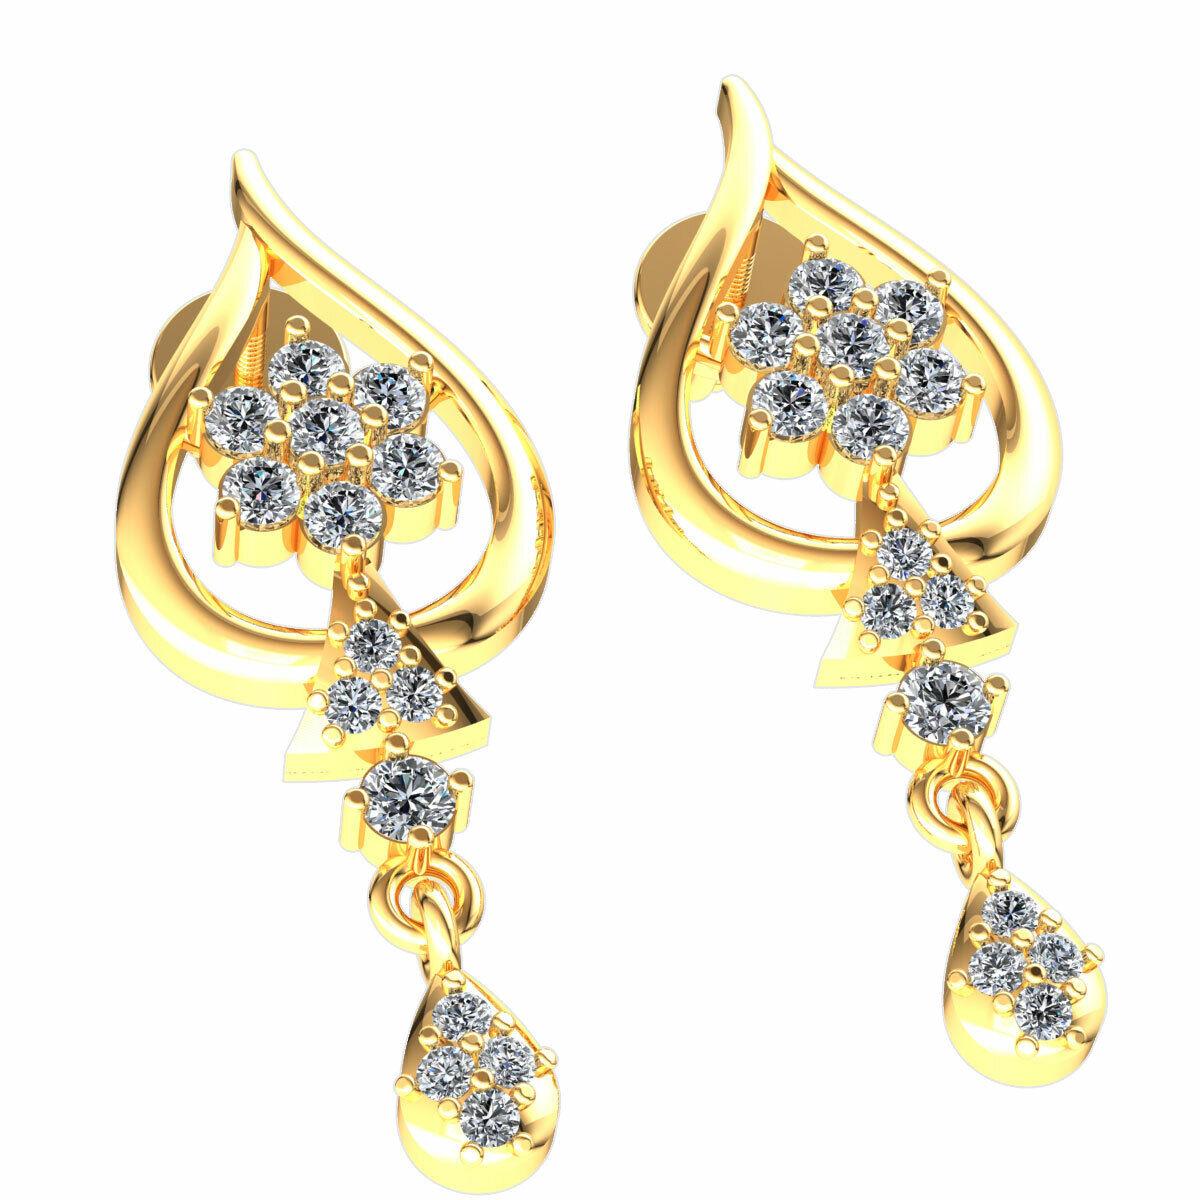 0.3ct Round Cut Not Enhanced Diamond Ladies Cluster Dangle Earrings 10K gold